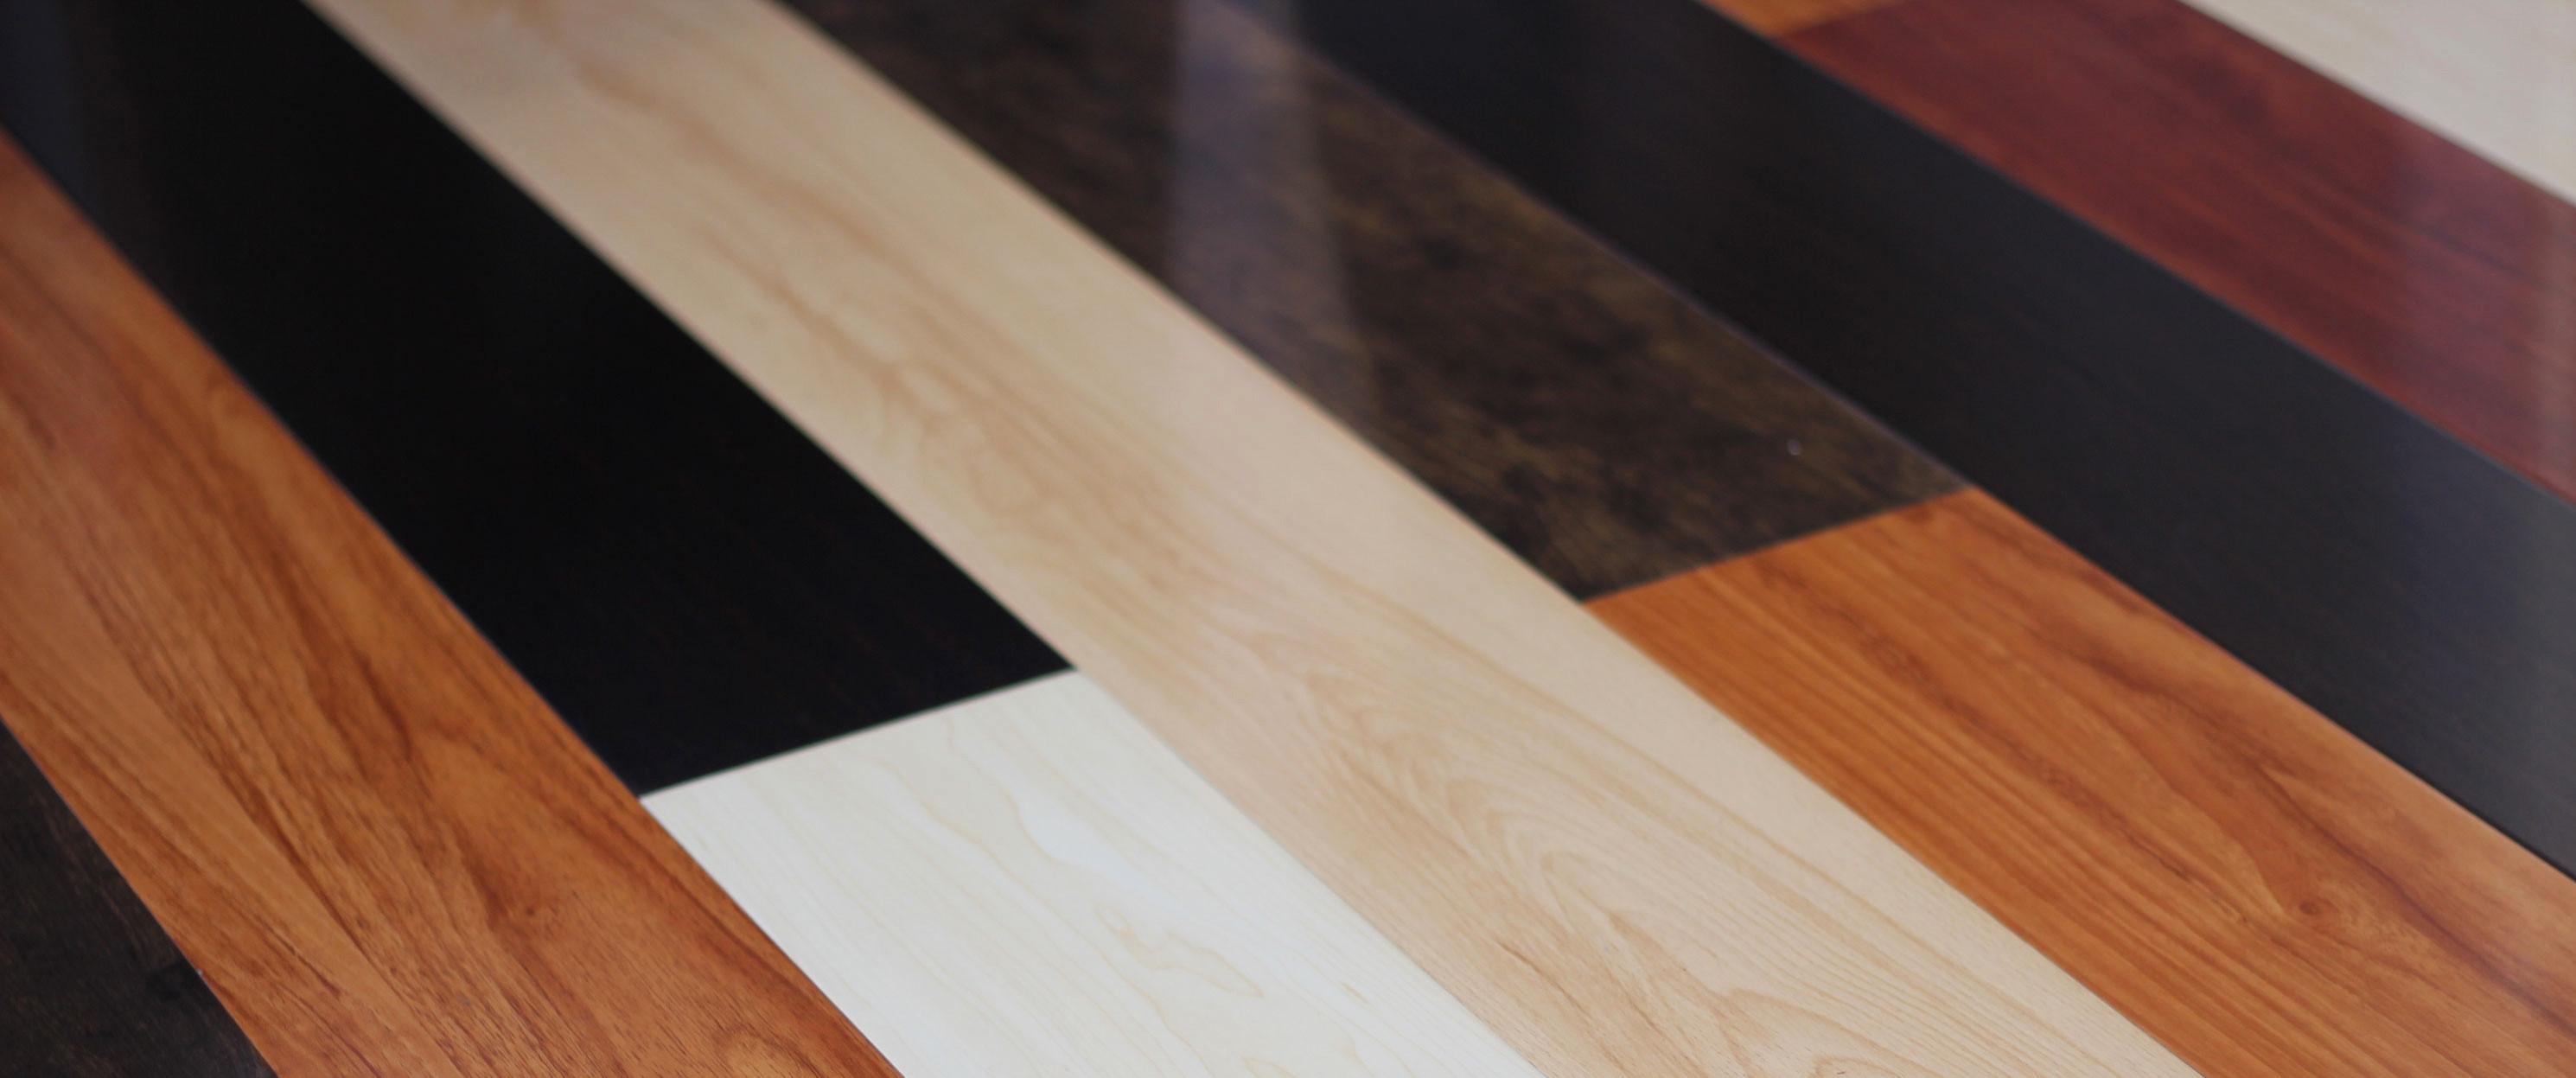 amber acacia hardwood flooring of flooring options flooring dining room designs stunning shaker chairs within flooring options where to buy hardwood flooring inspirational 0d grace place barnegat